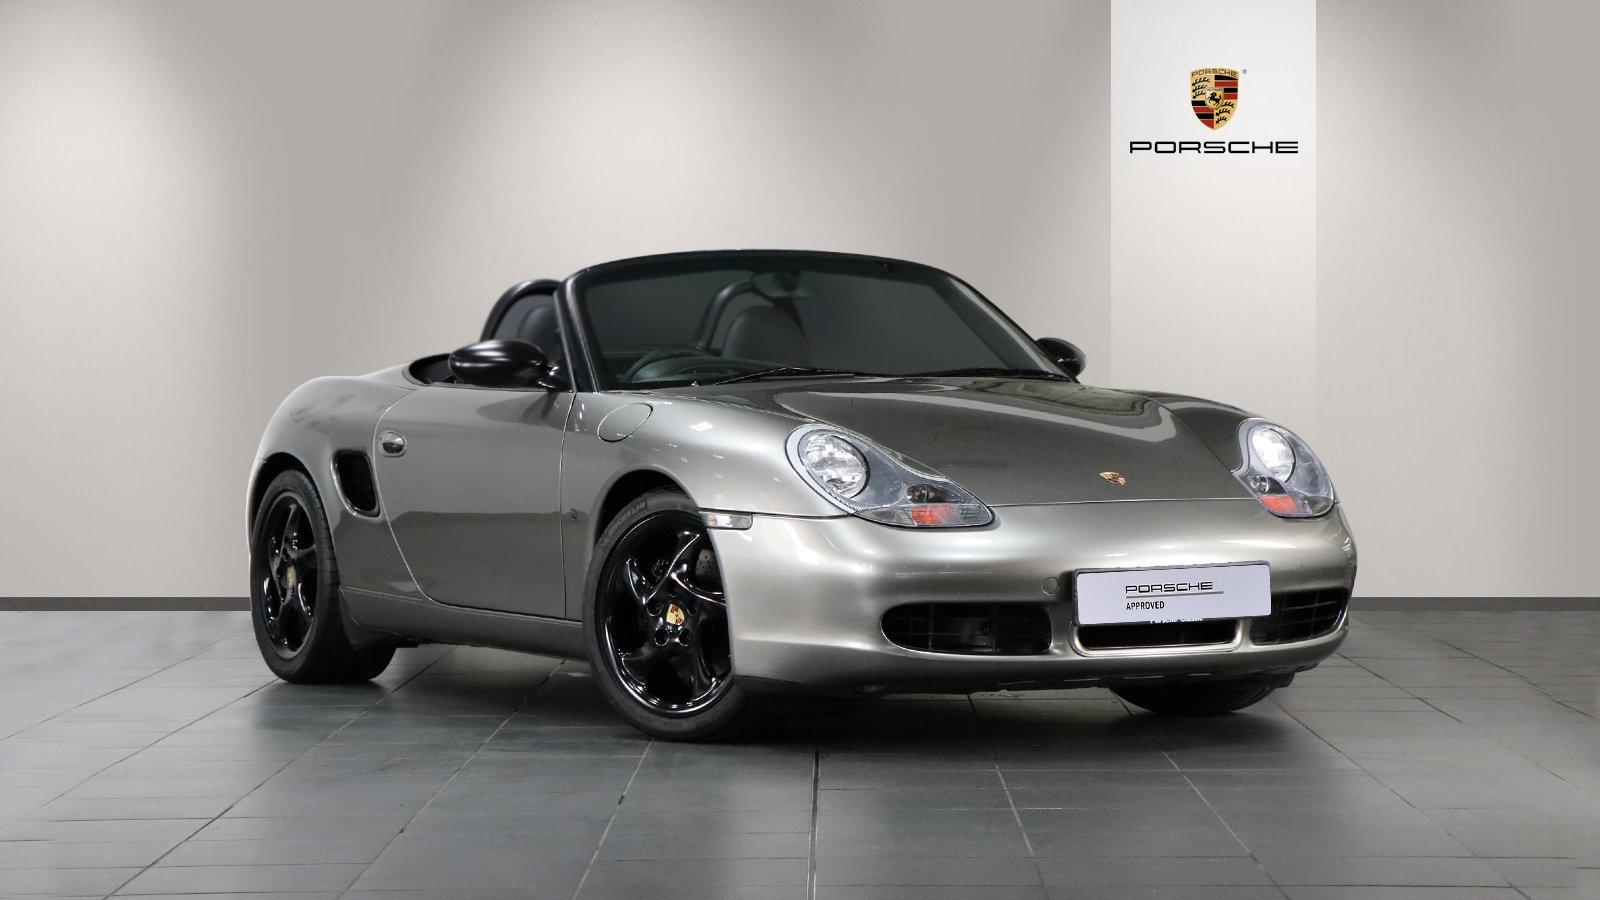 2002 Porsche Boxster S Porsche Gb Restoration For Sale